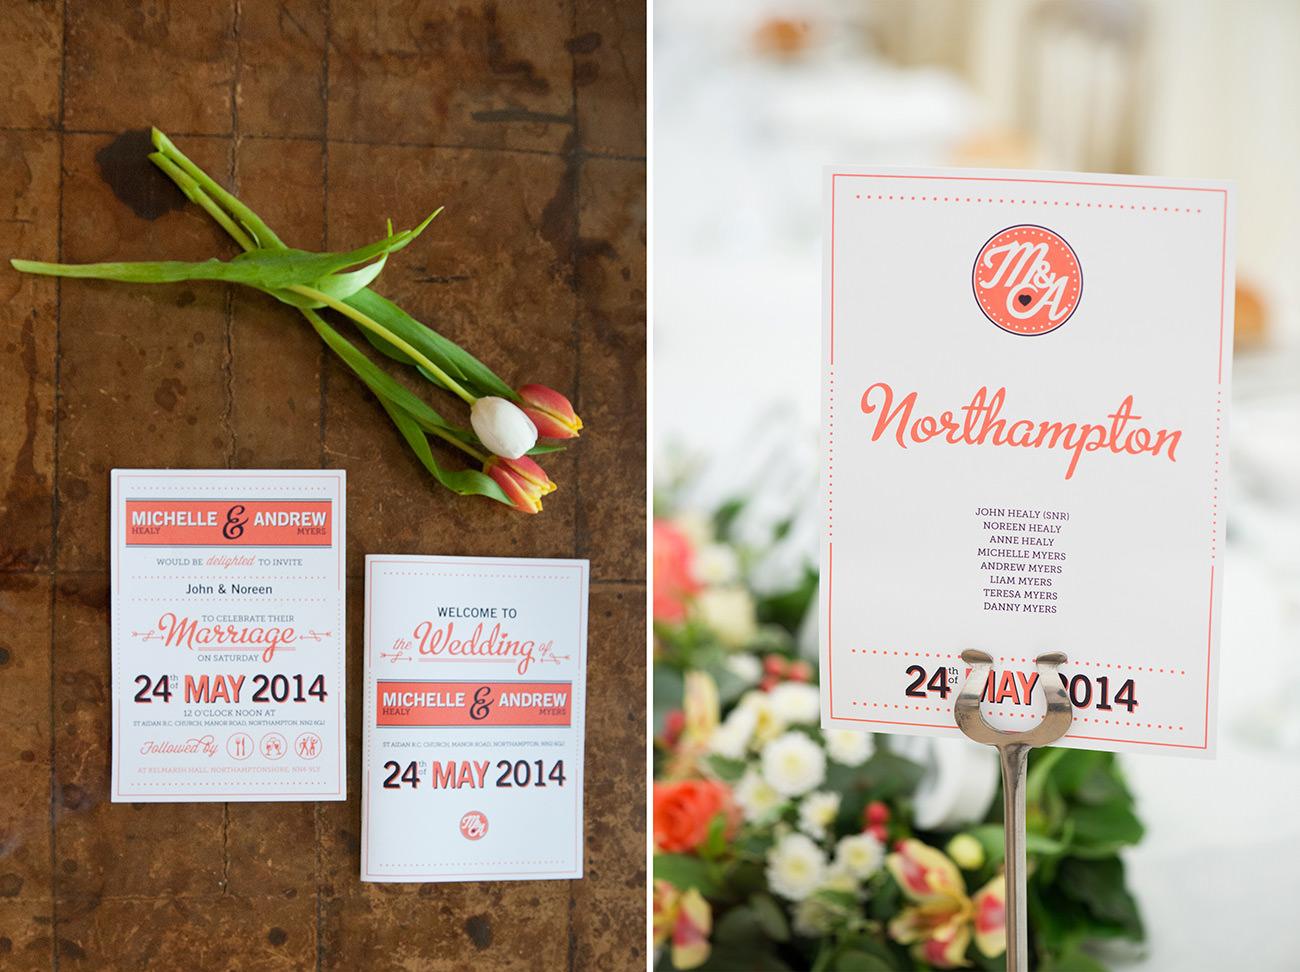 Kelmarsh hall asian wedding invitations